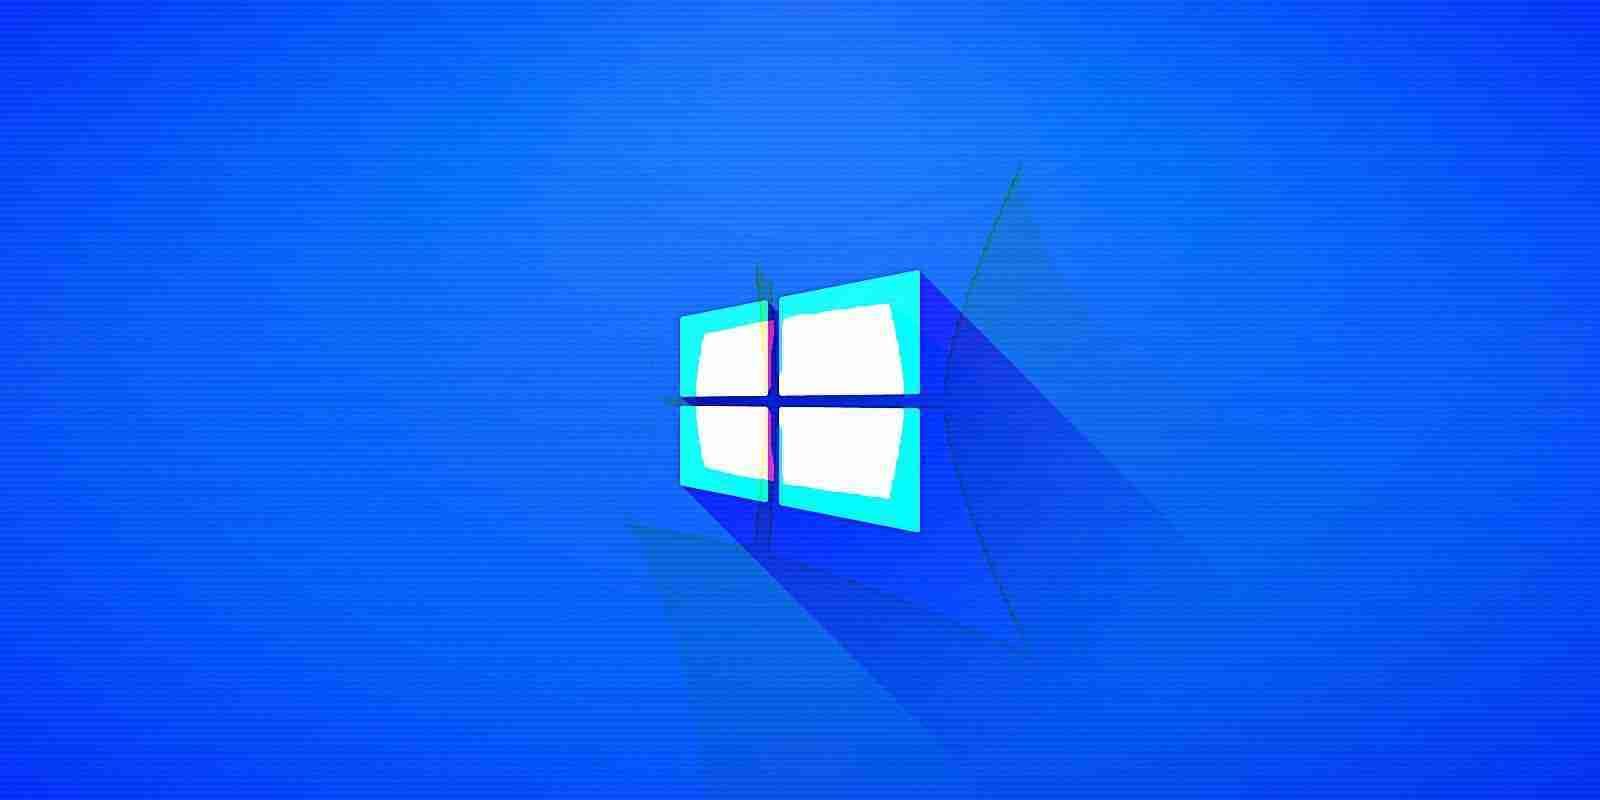 Microsoft Warns Of Incoming Windows Zerologon Patch Enforcement